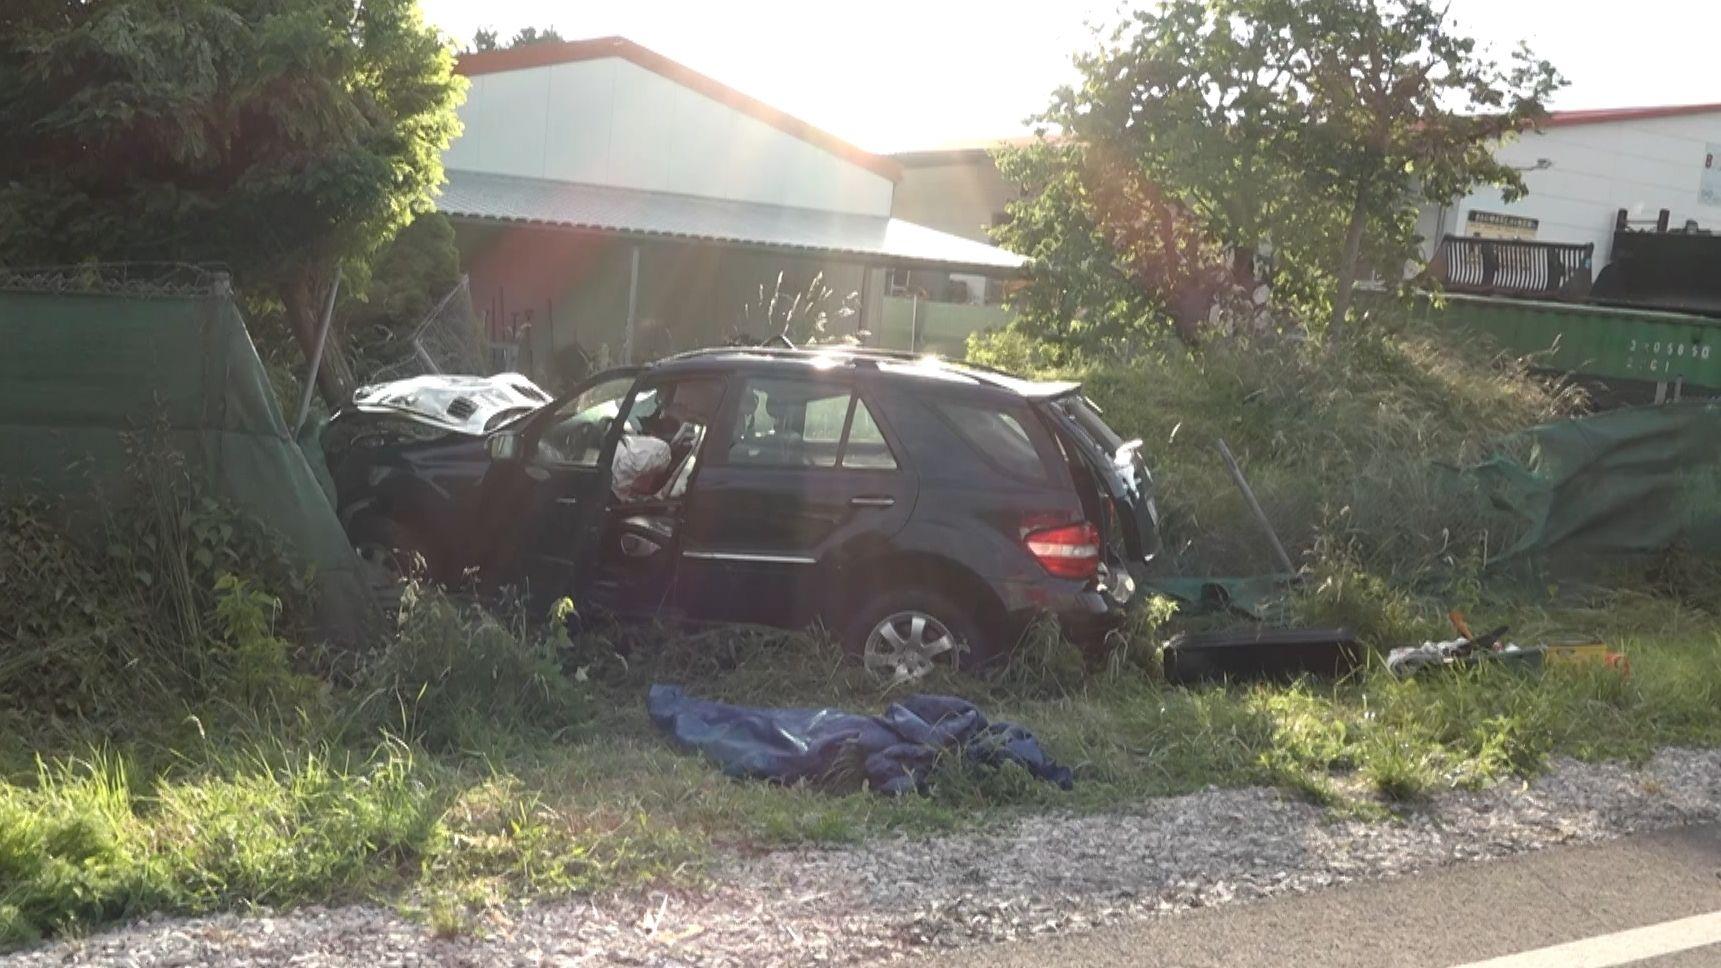 Bei einem Verkehrsunfall bei Ingolstadt sind zwei Menschen ums Leben gekommen.